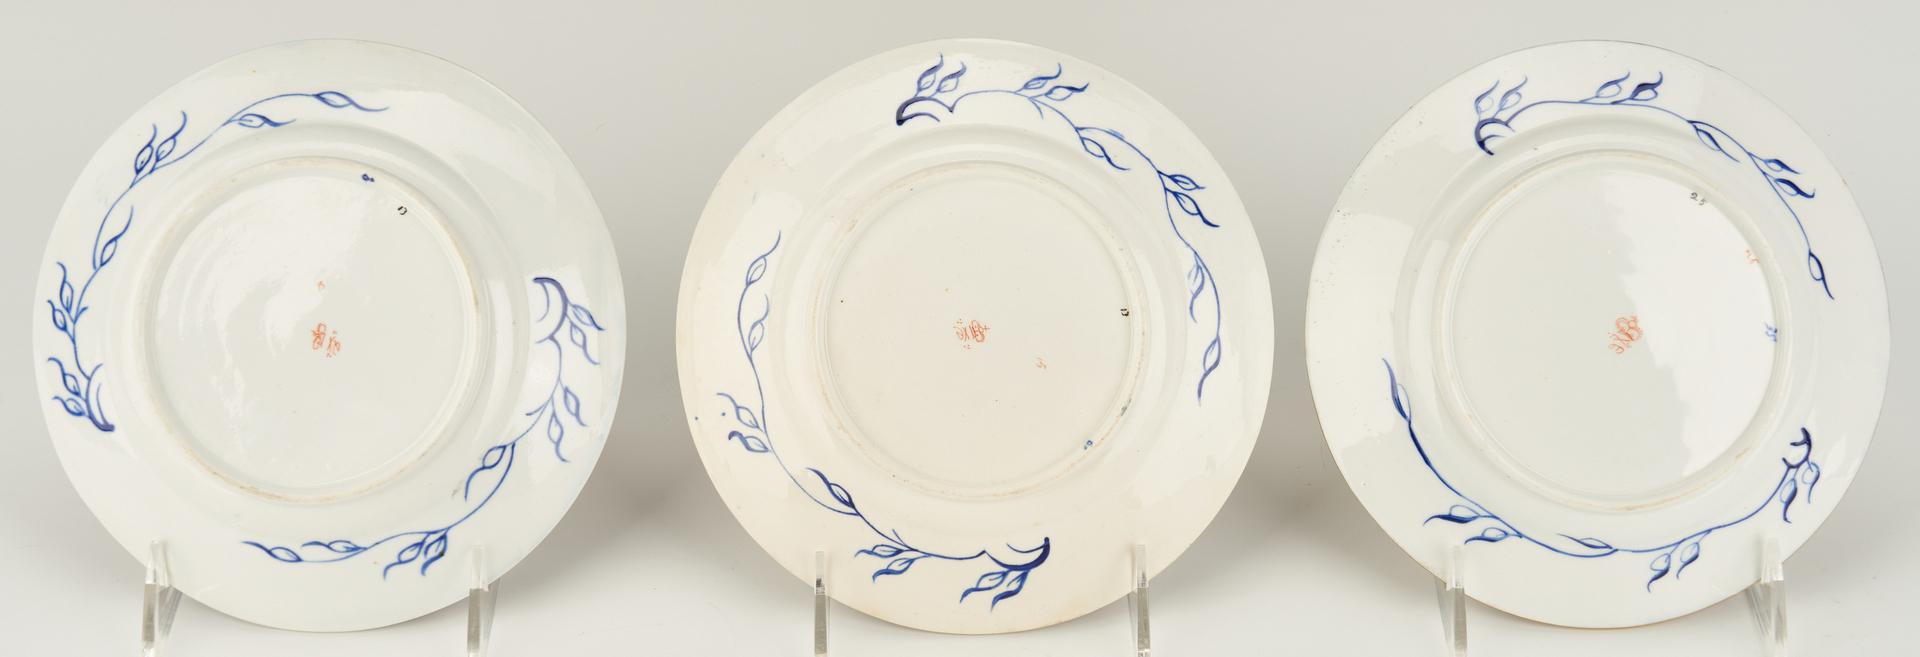 Lot 306: 38 Royal Crown Derby Porcelain Kings Pattern Dinnerware Pieces